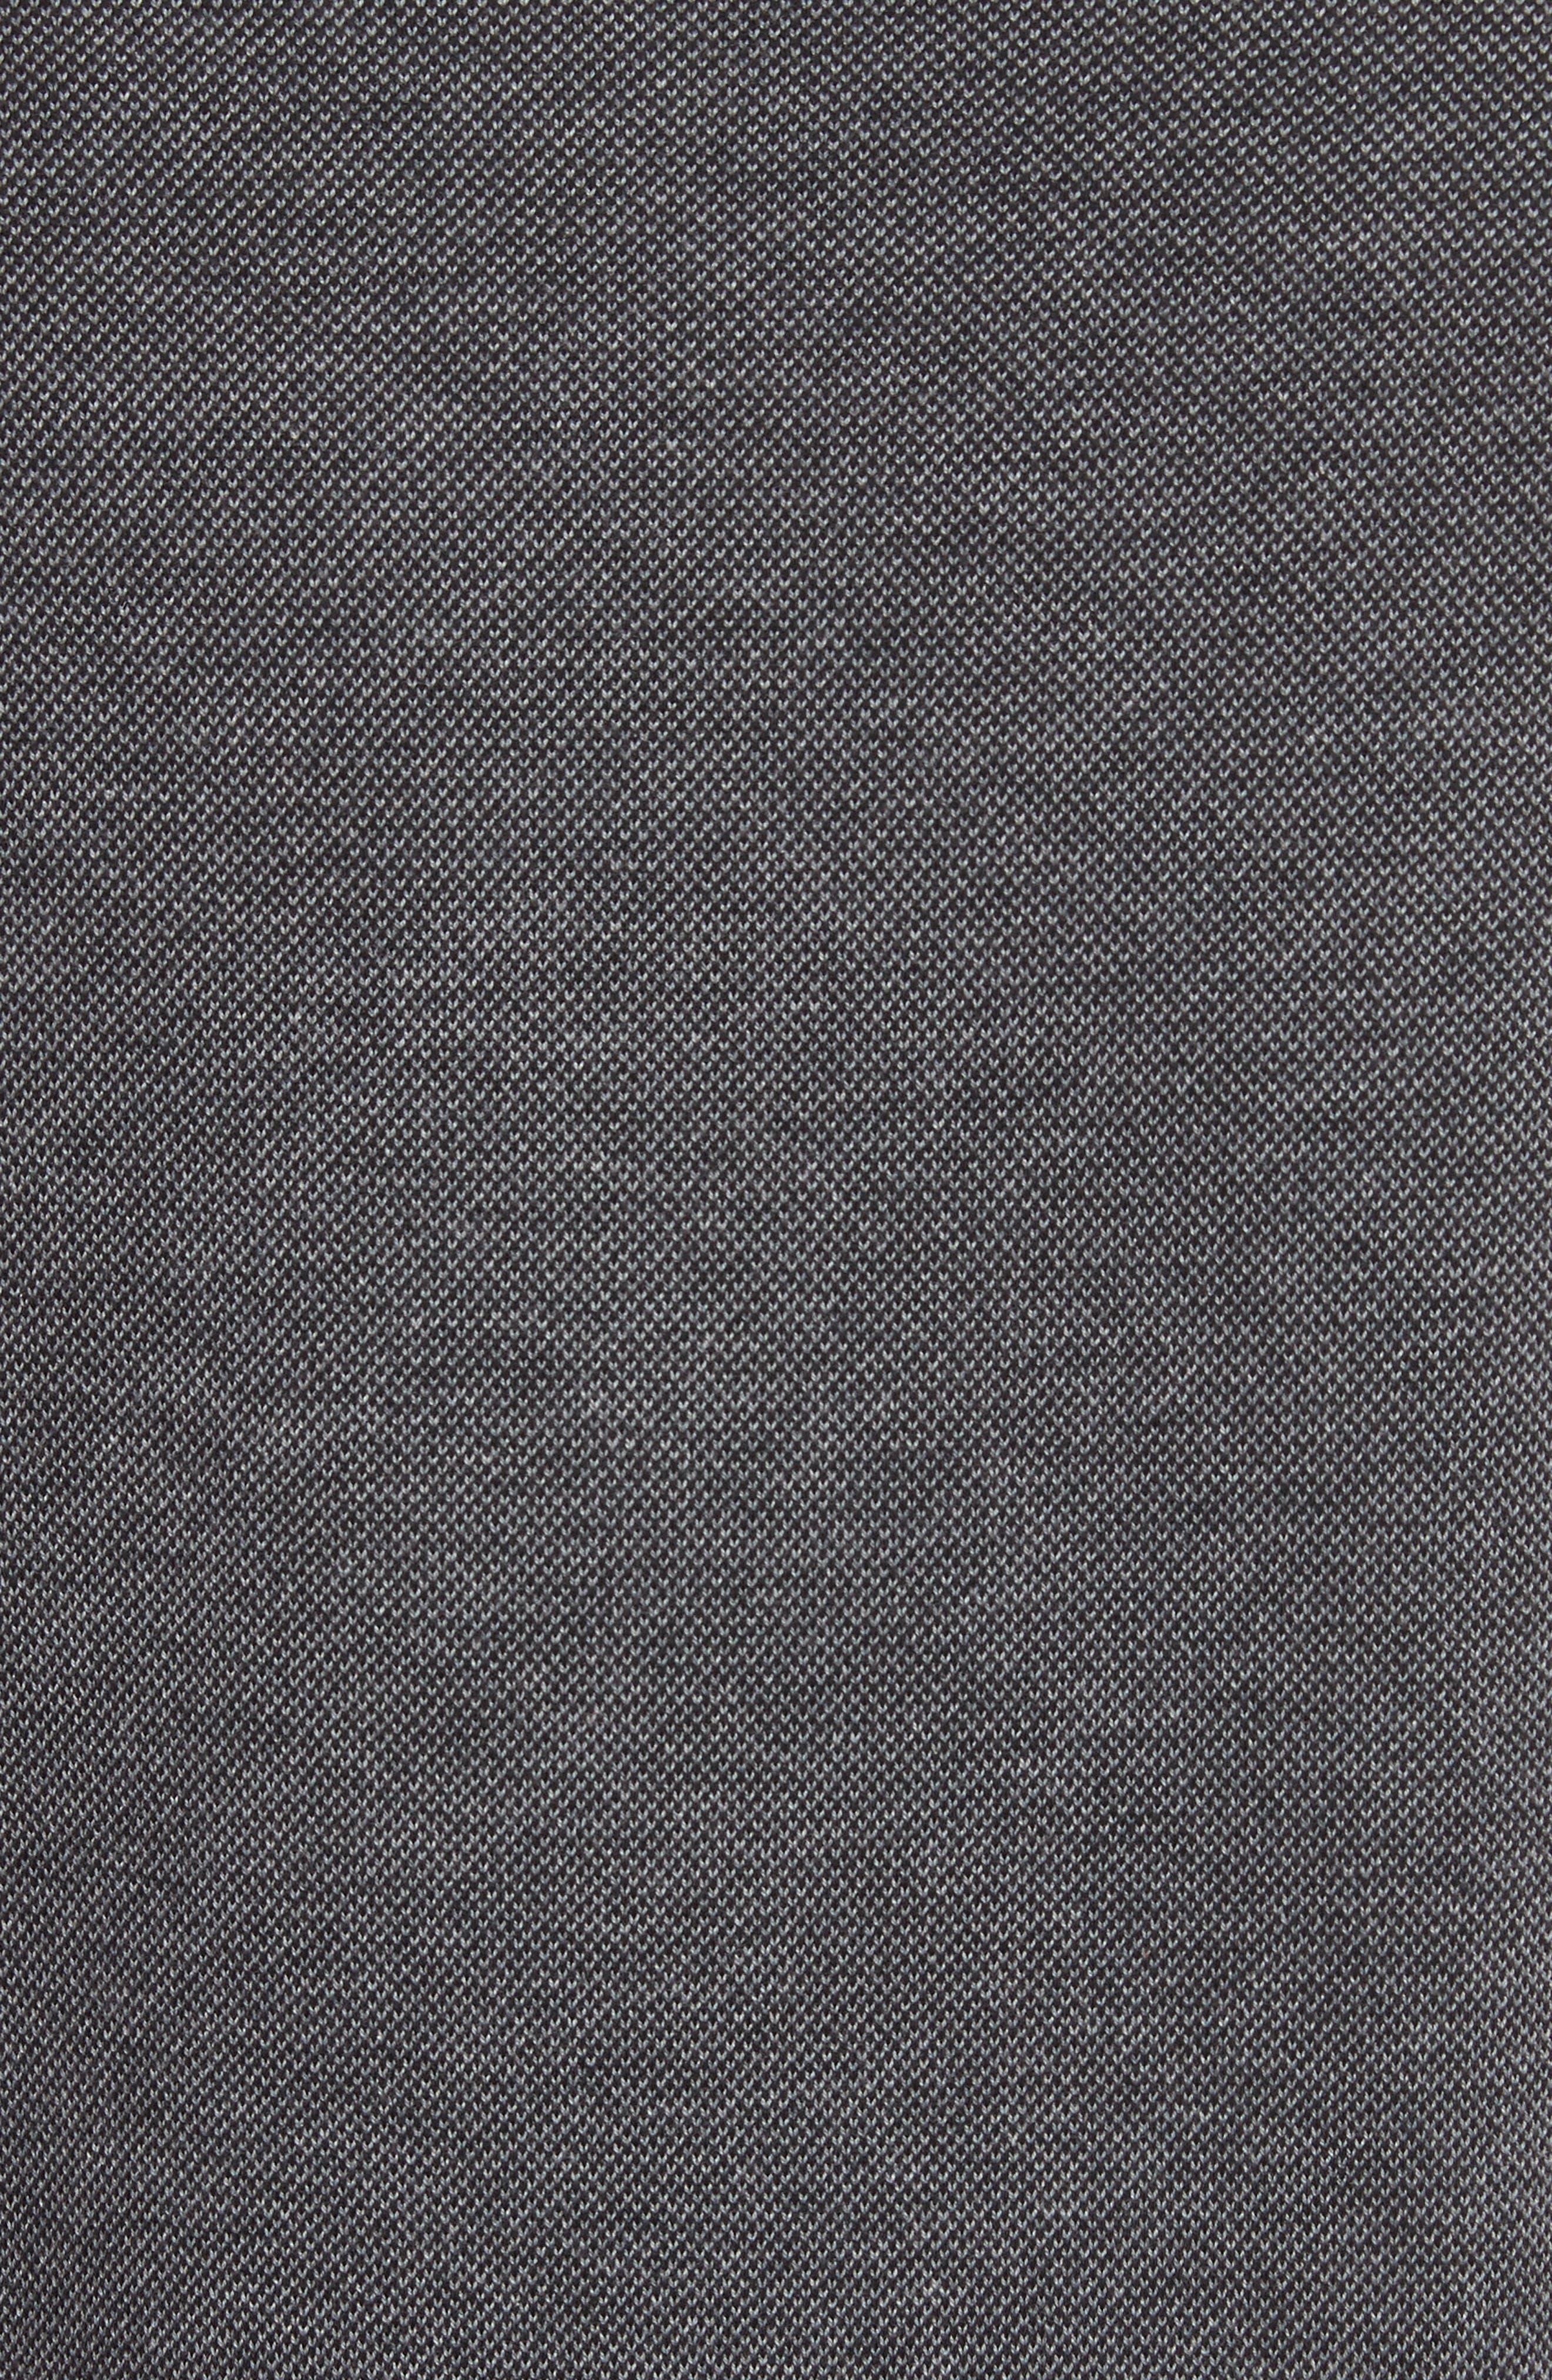 Textured Cotton Sweatshirt,                             Alternate thumbnail 5, color,                             Charcoal